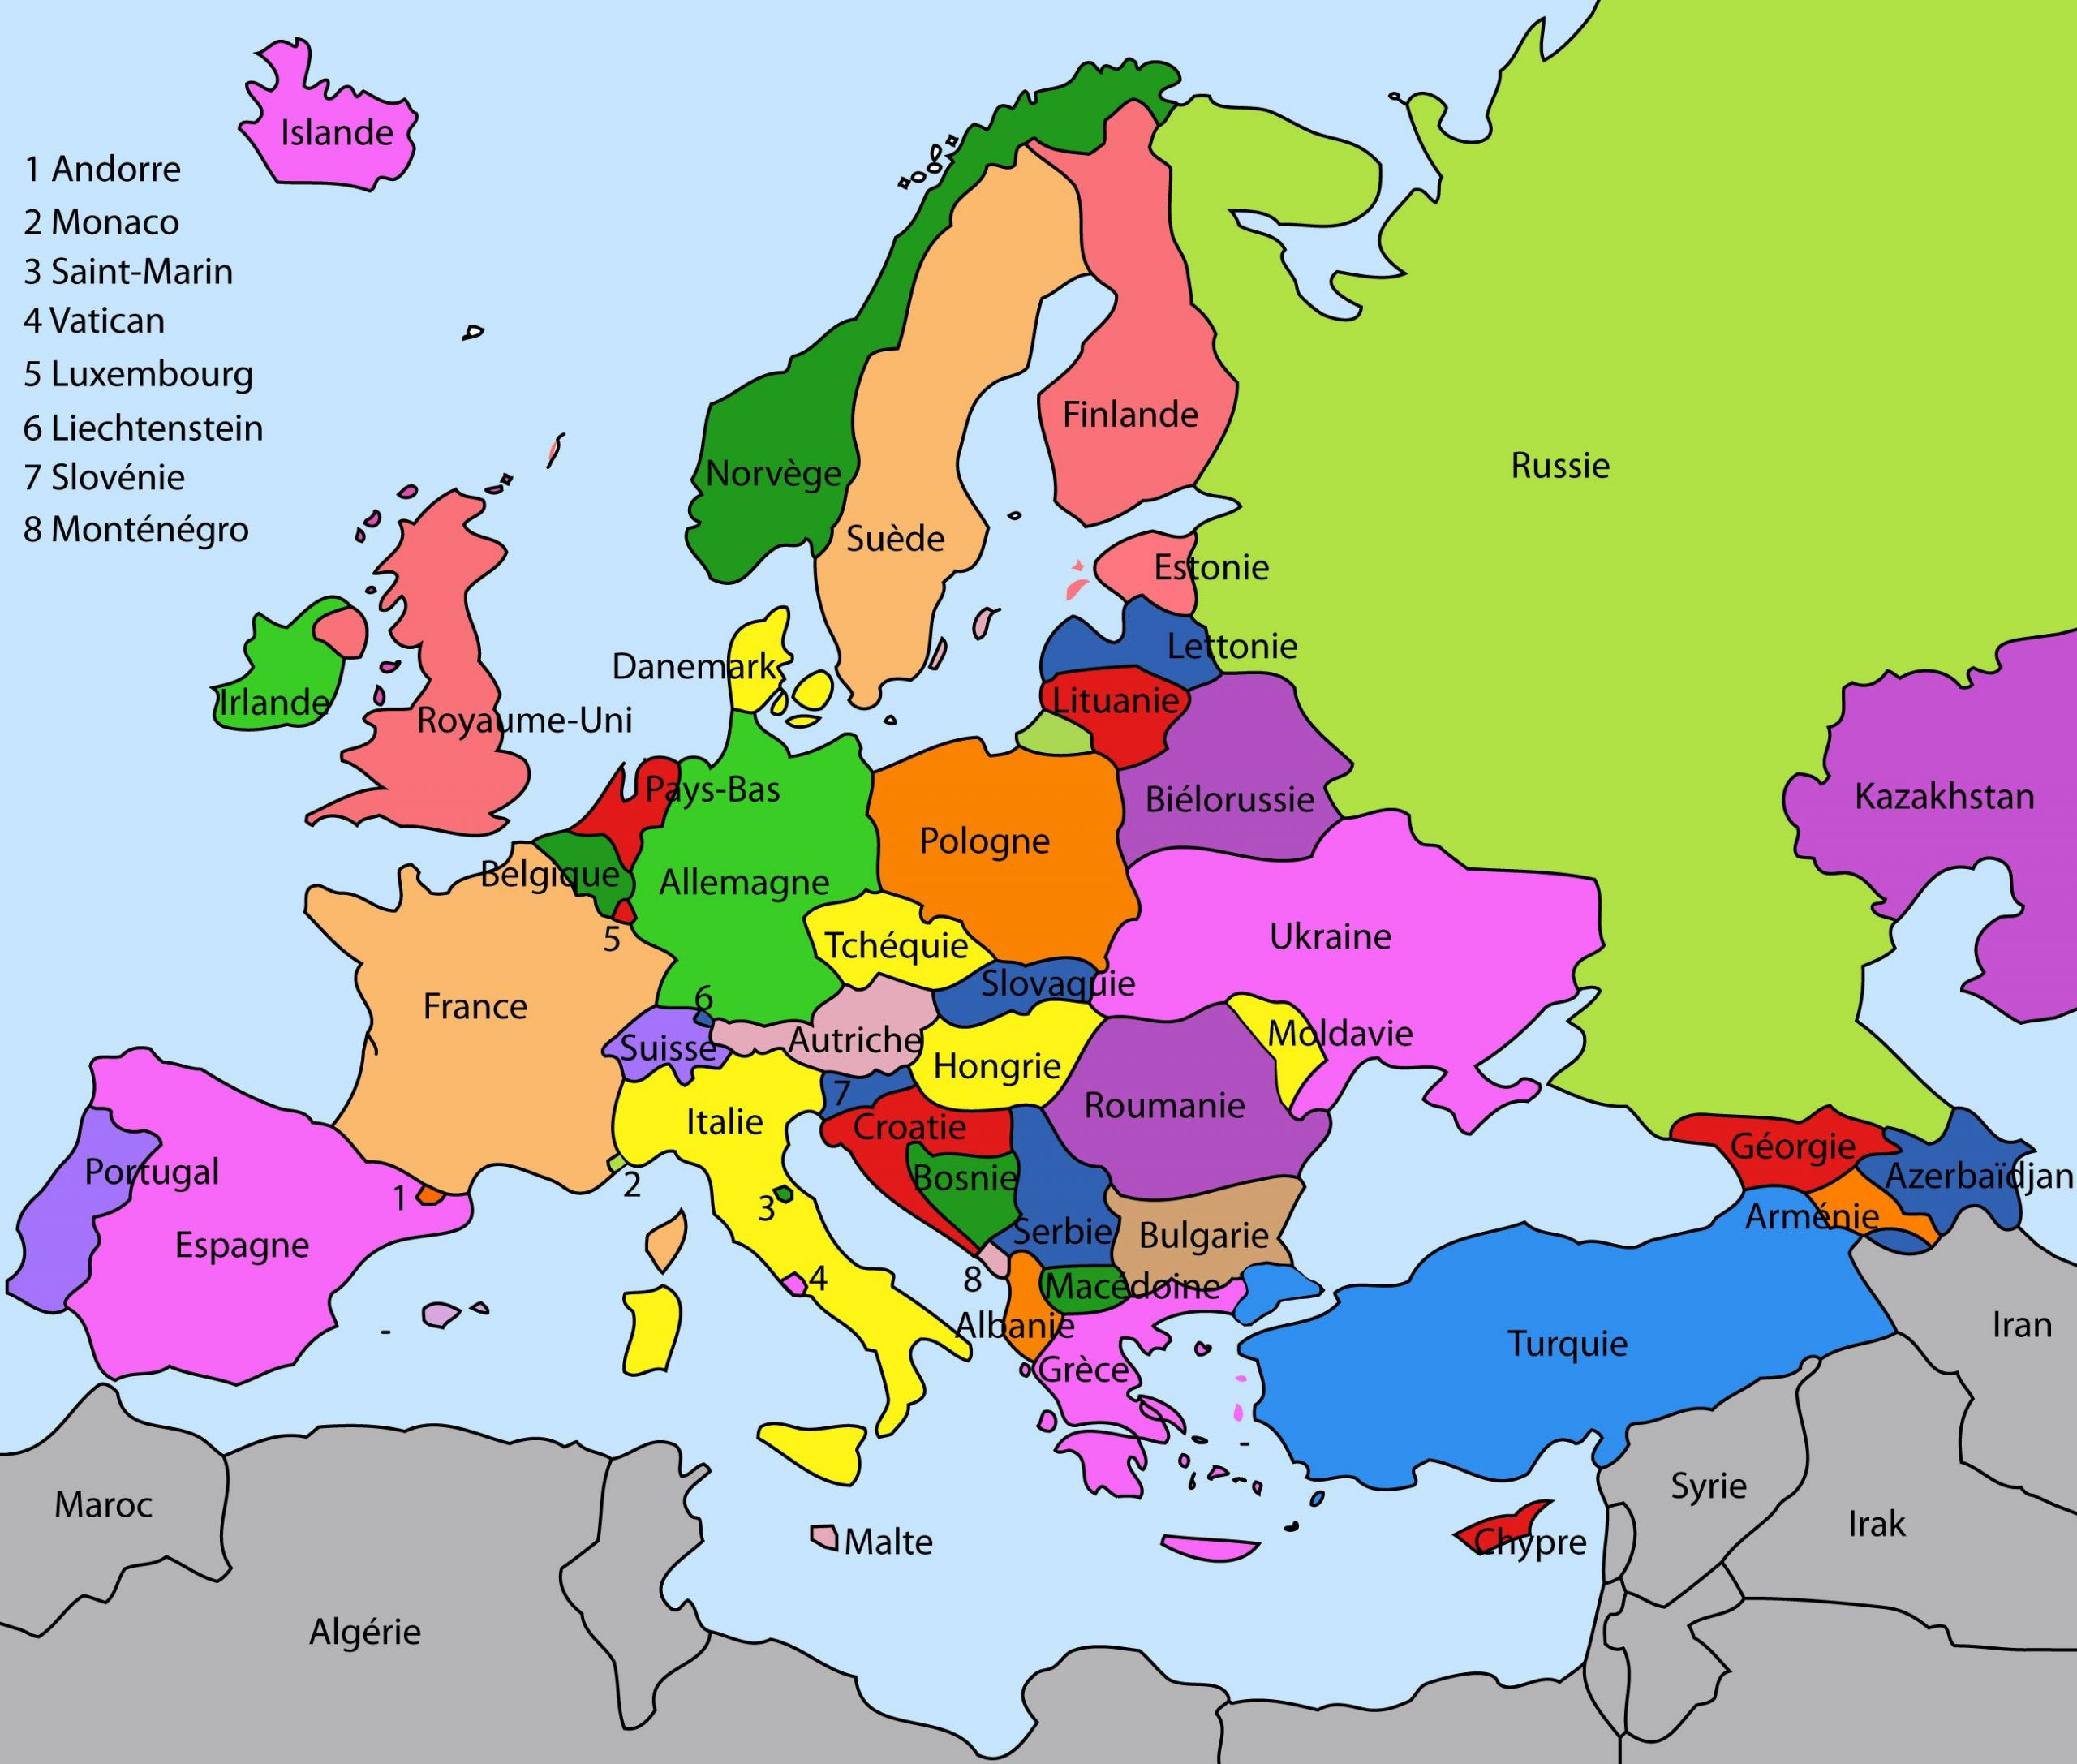 Carte Des Pays De L'europe | Carte Europe, Carte Europe Pays intérieur Carte De L Europe En Relief